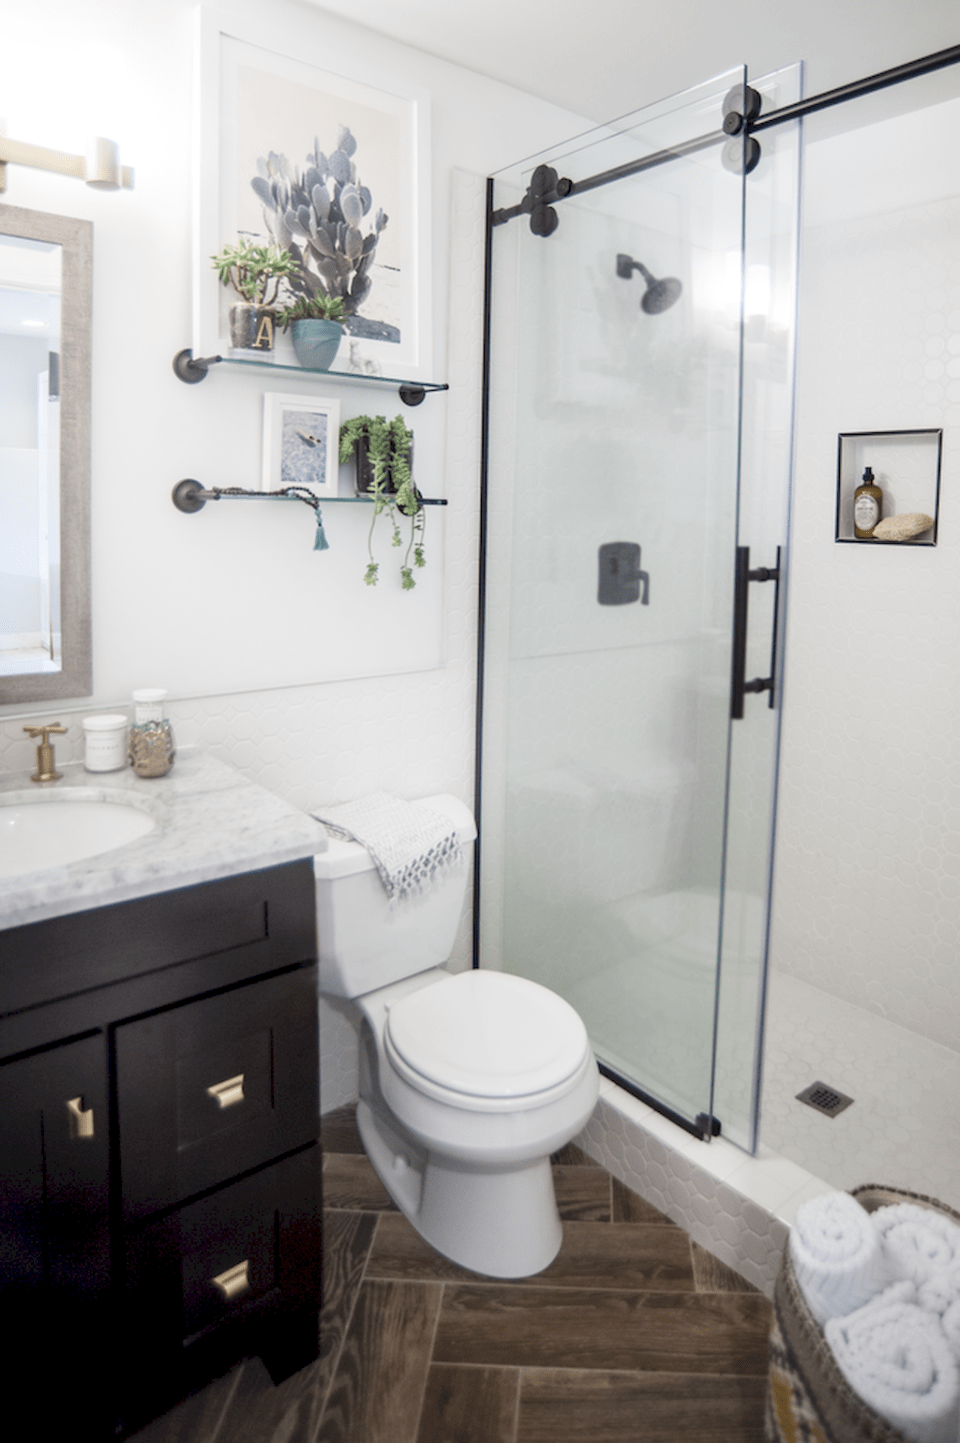 85 Beautiful Small Bathroom Decor Ideas on A Budget ...